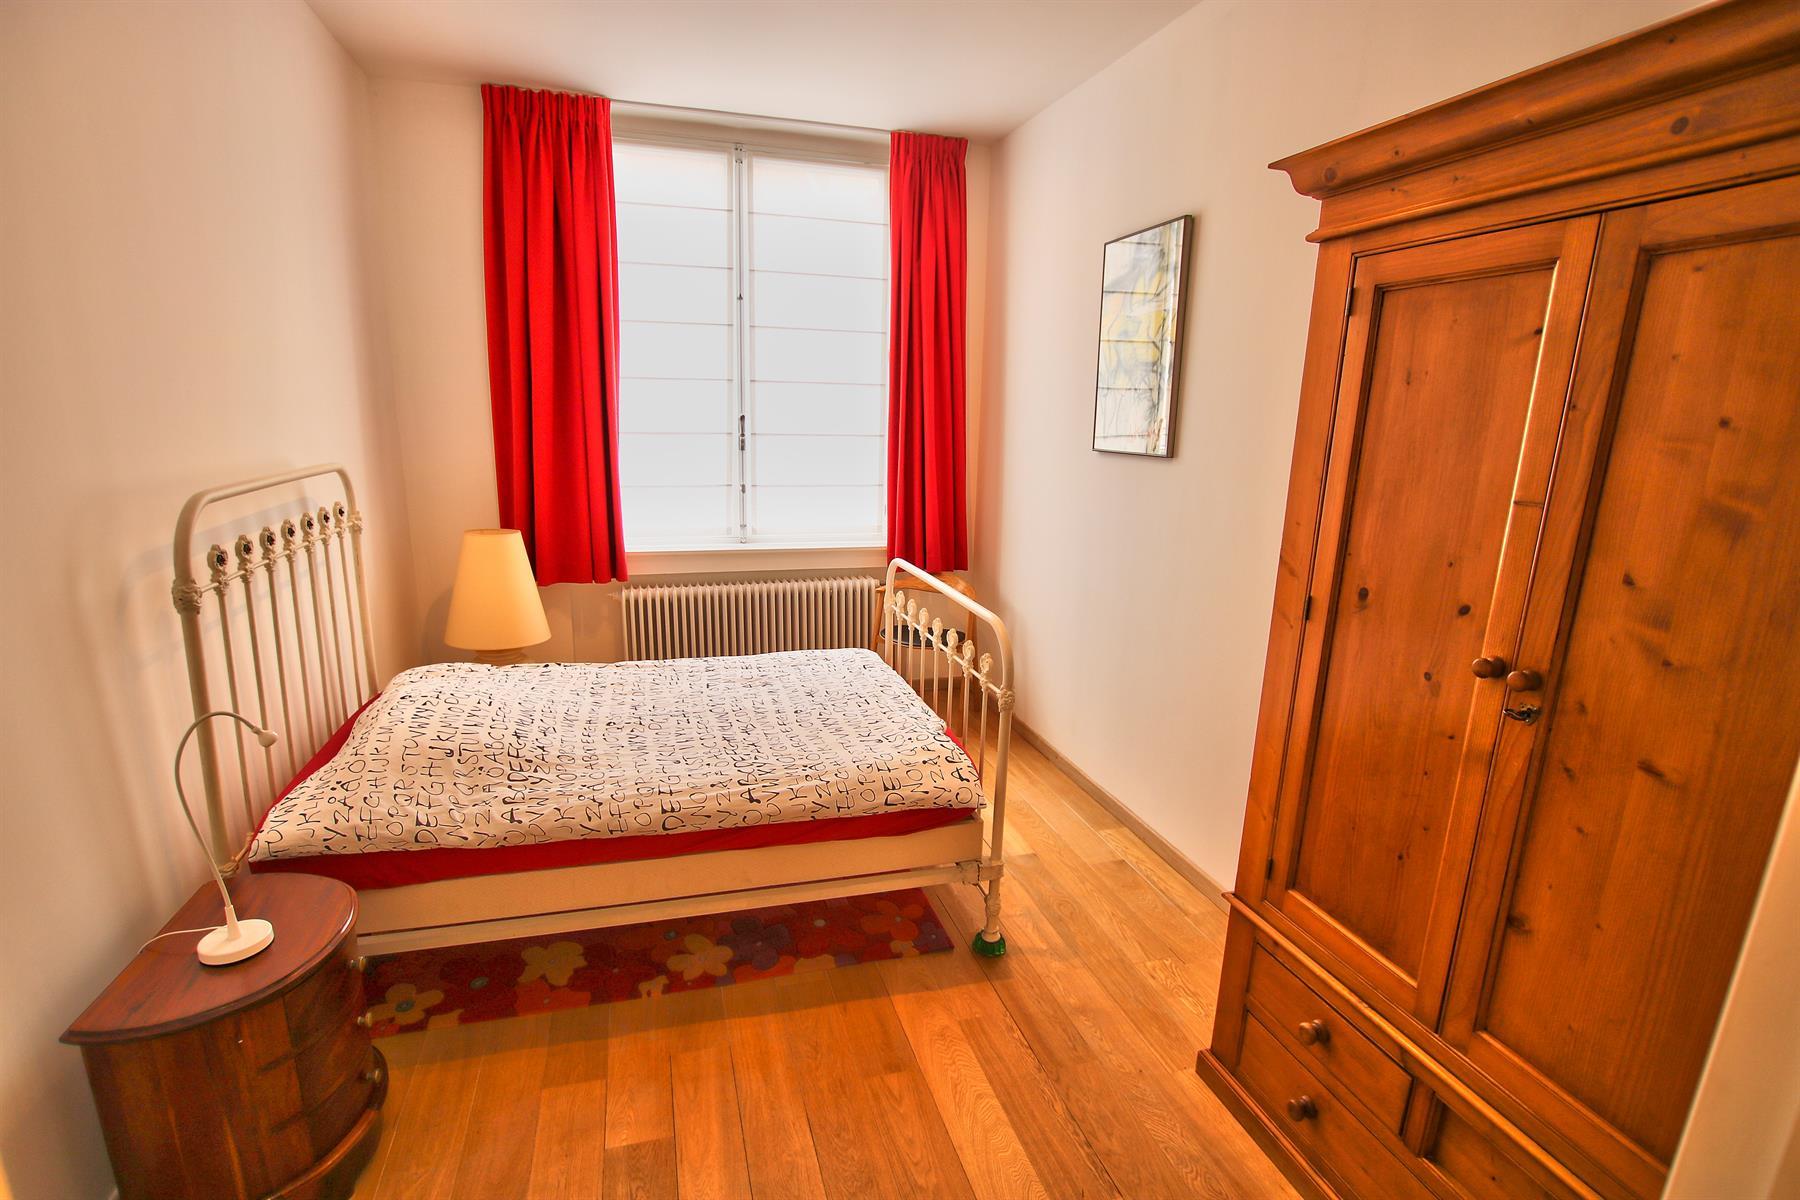 Maison - Etterbeek - #4454540-14